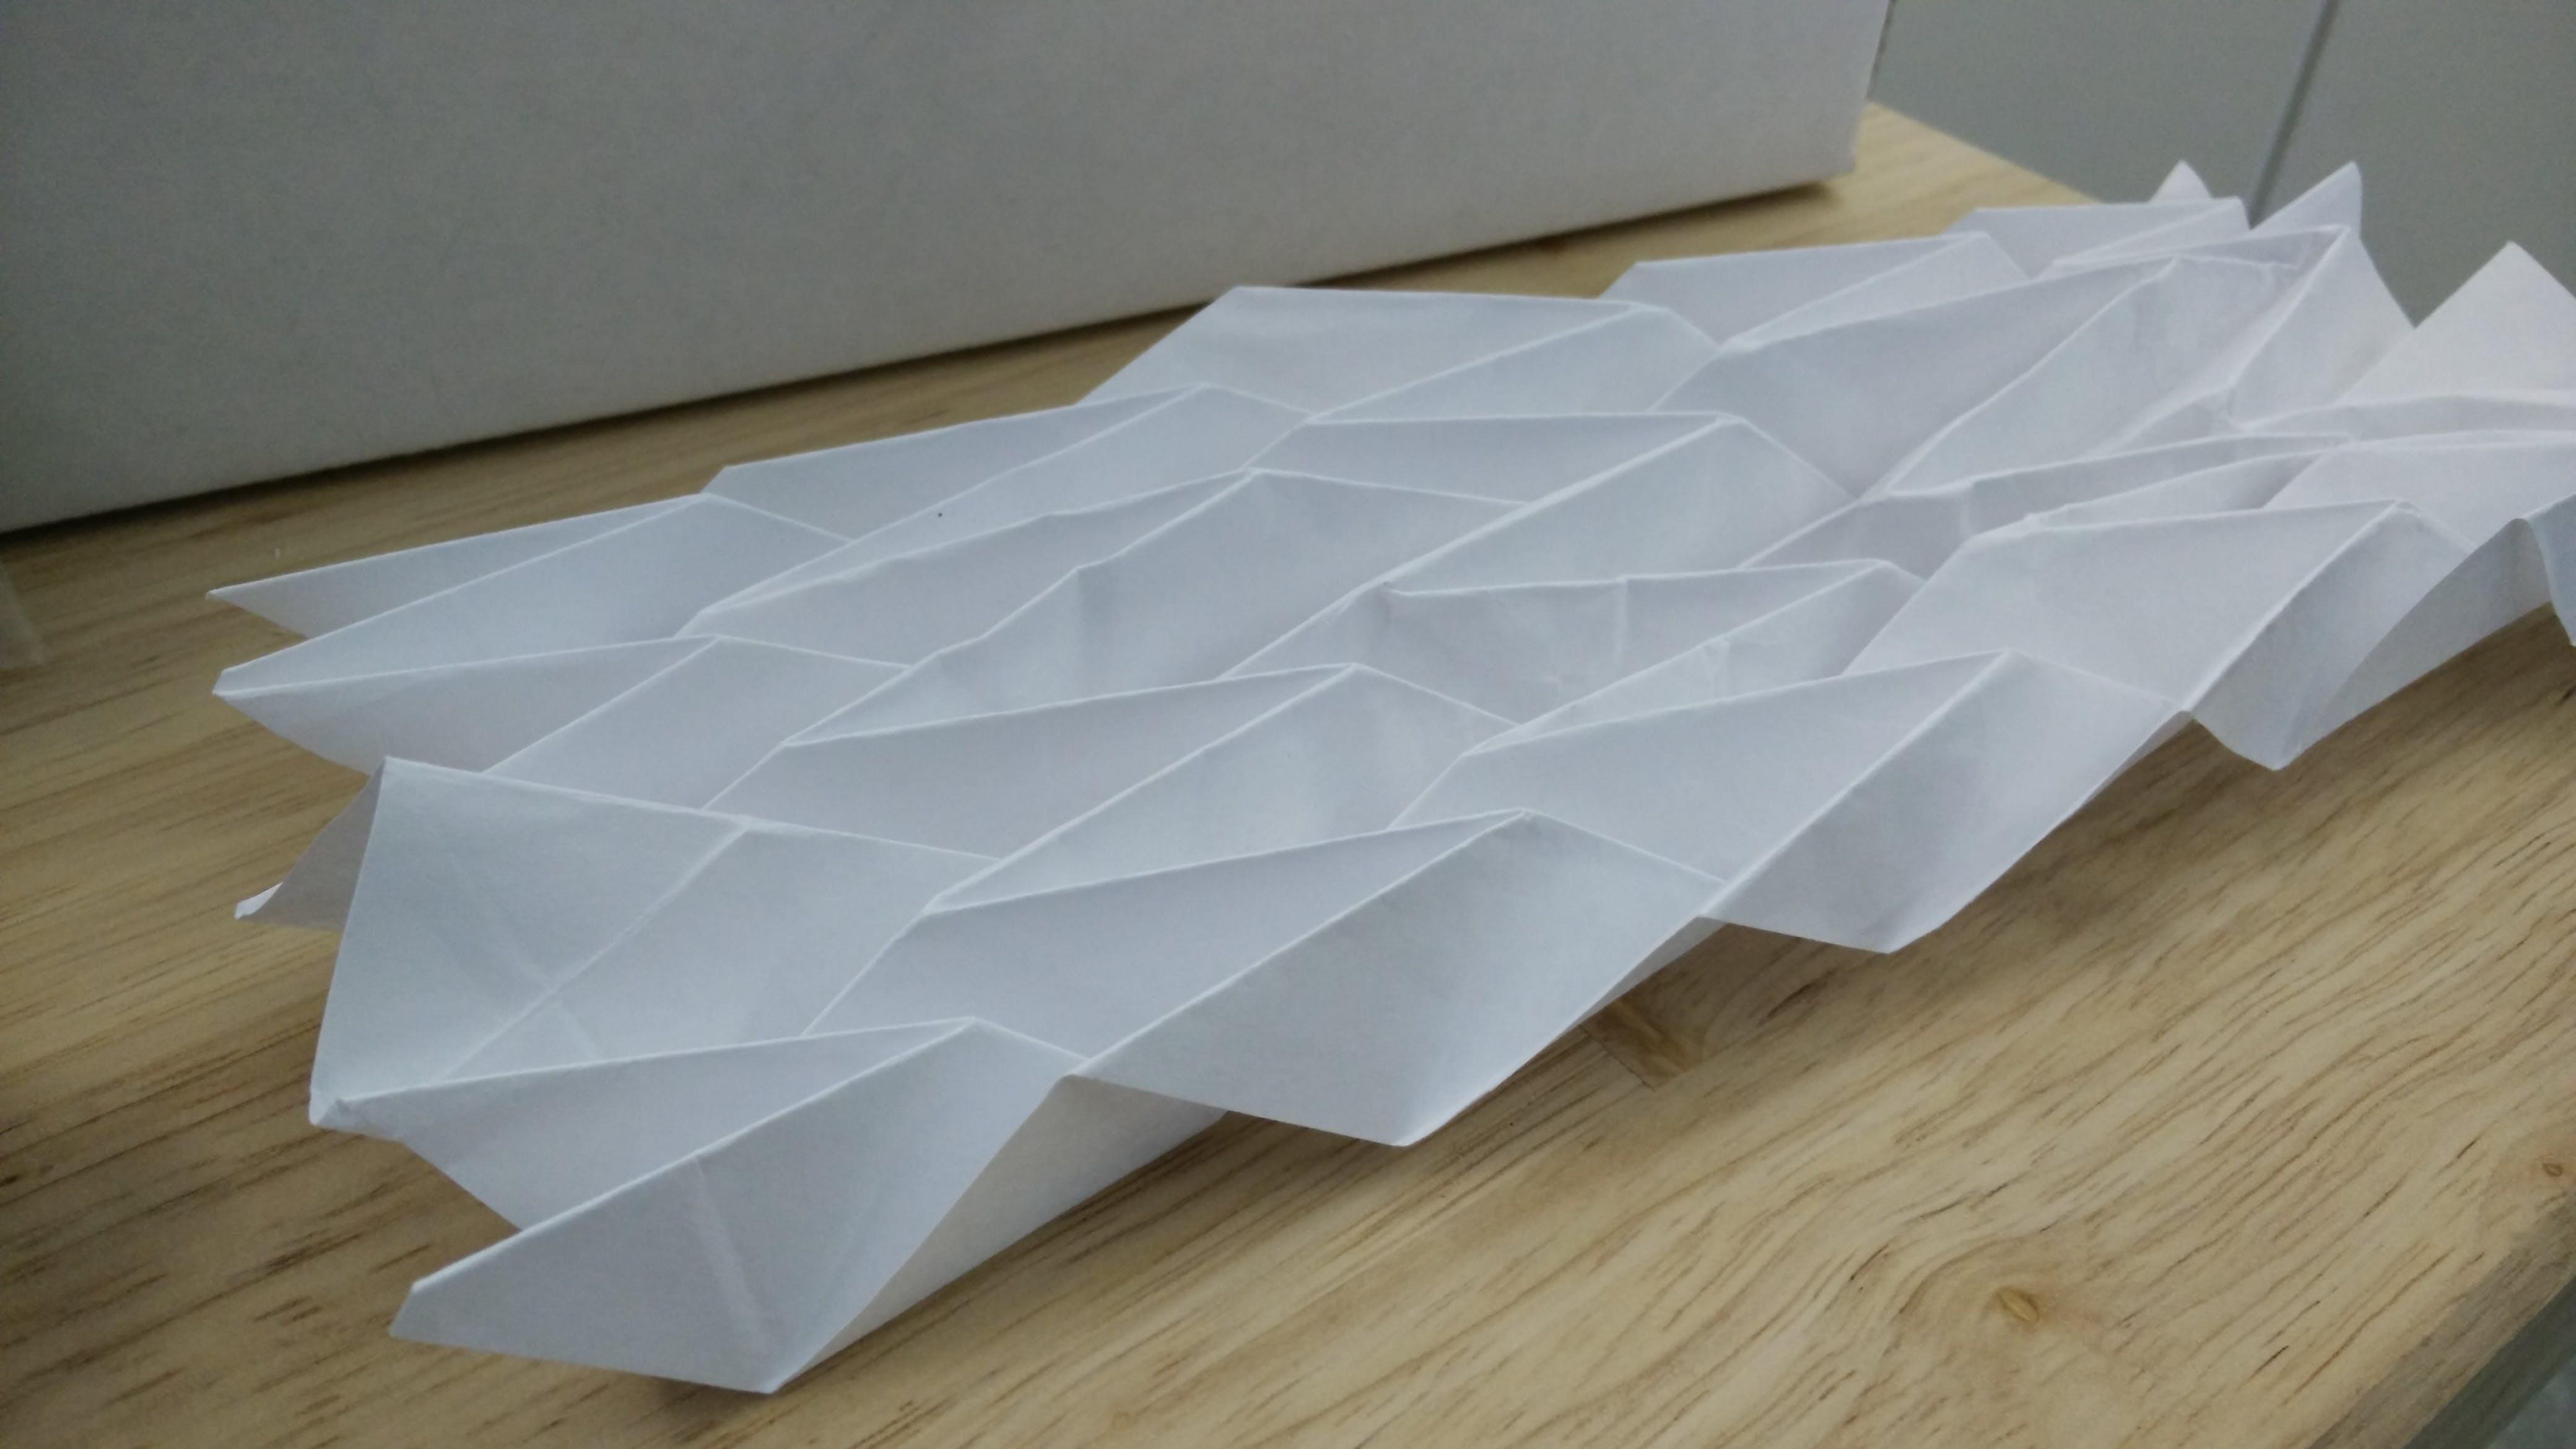 Miura-Ori Origami Tessellation